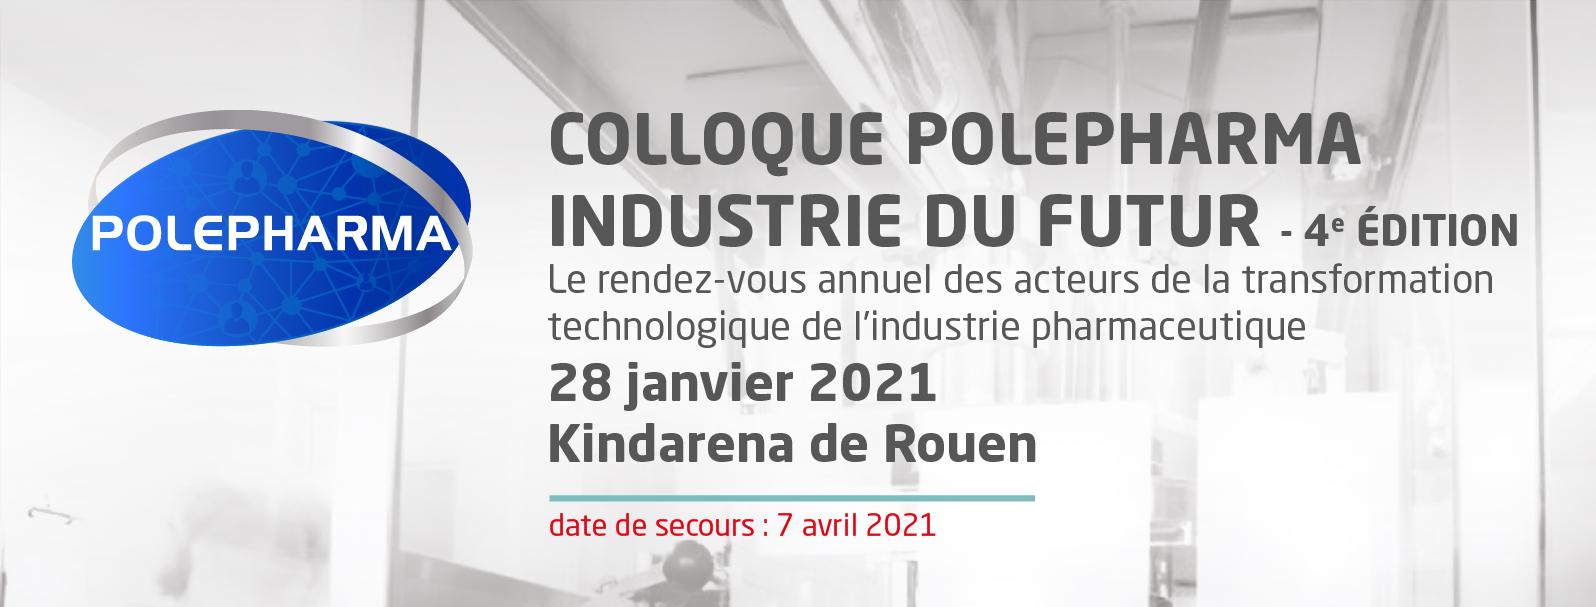 banniere-CPIF2021-vf (1)